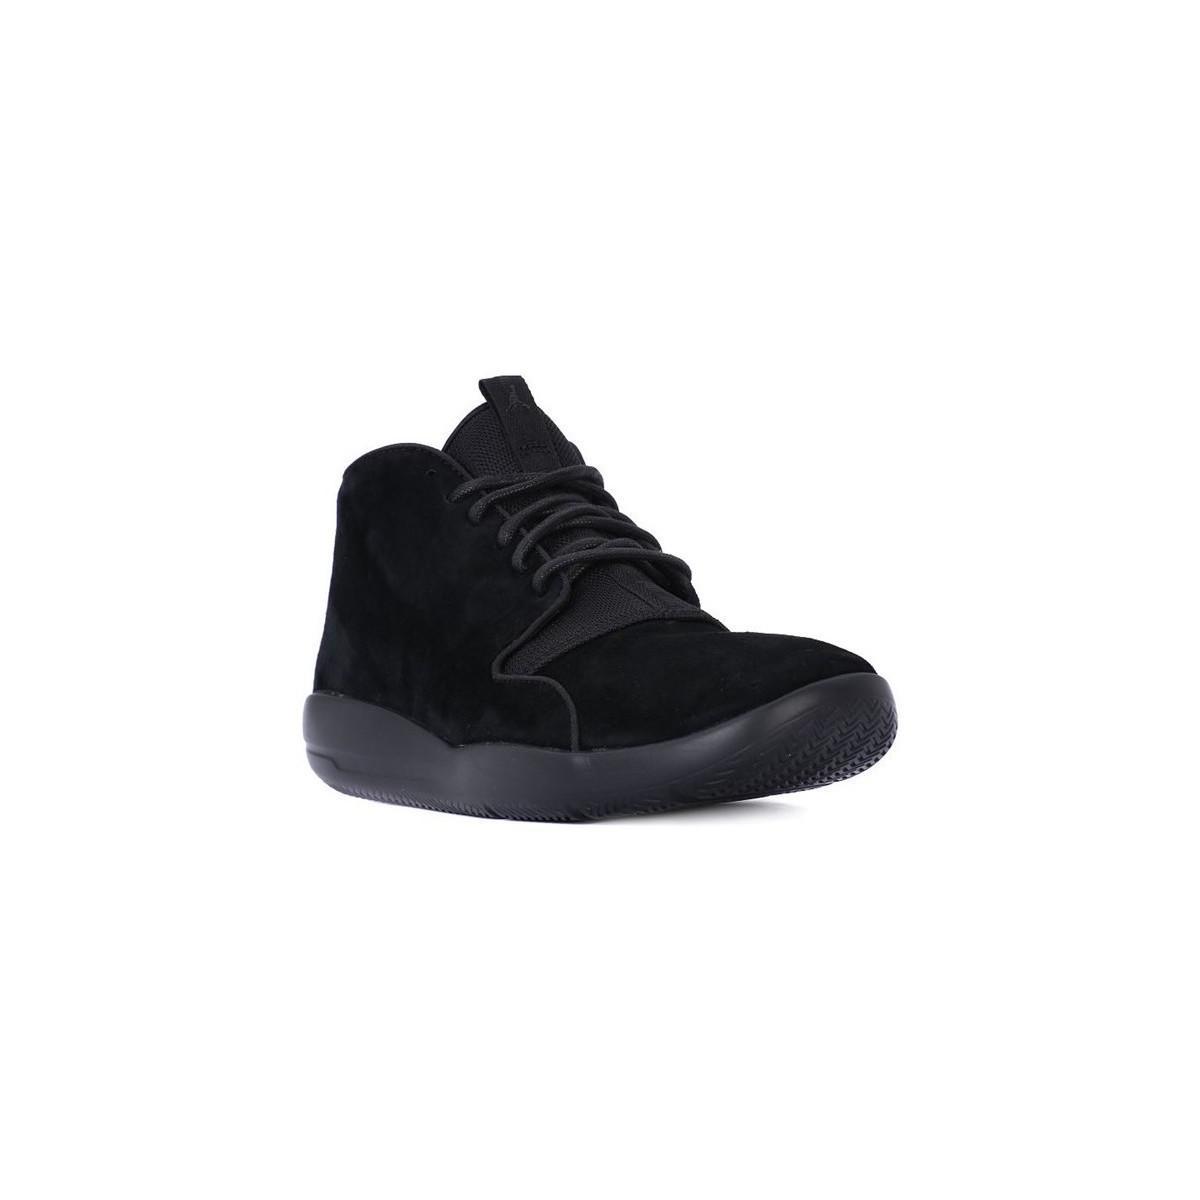 buy popular c6c67 bf0b7 high In Jordan Men s Trainers Shoes Chukka Top Lea Nike Eclipse gzYCwqwv